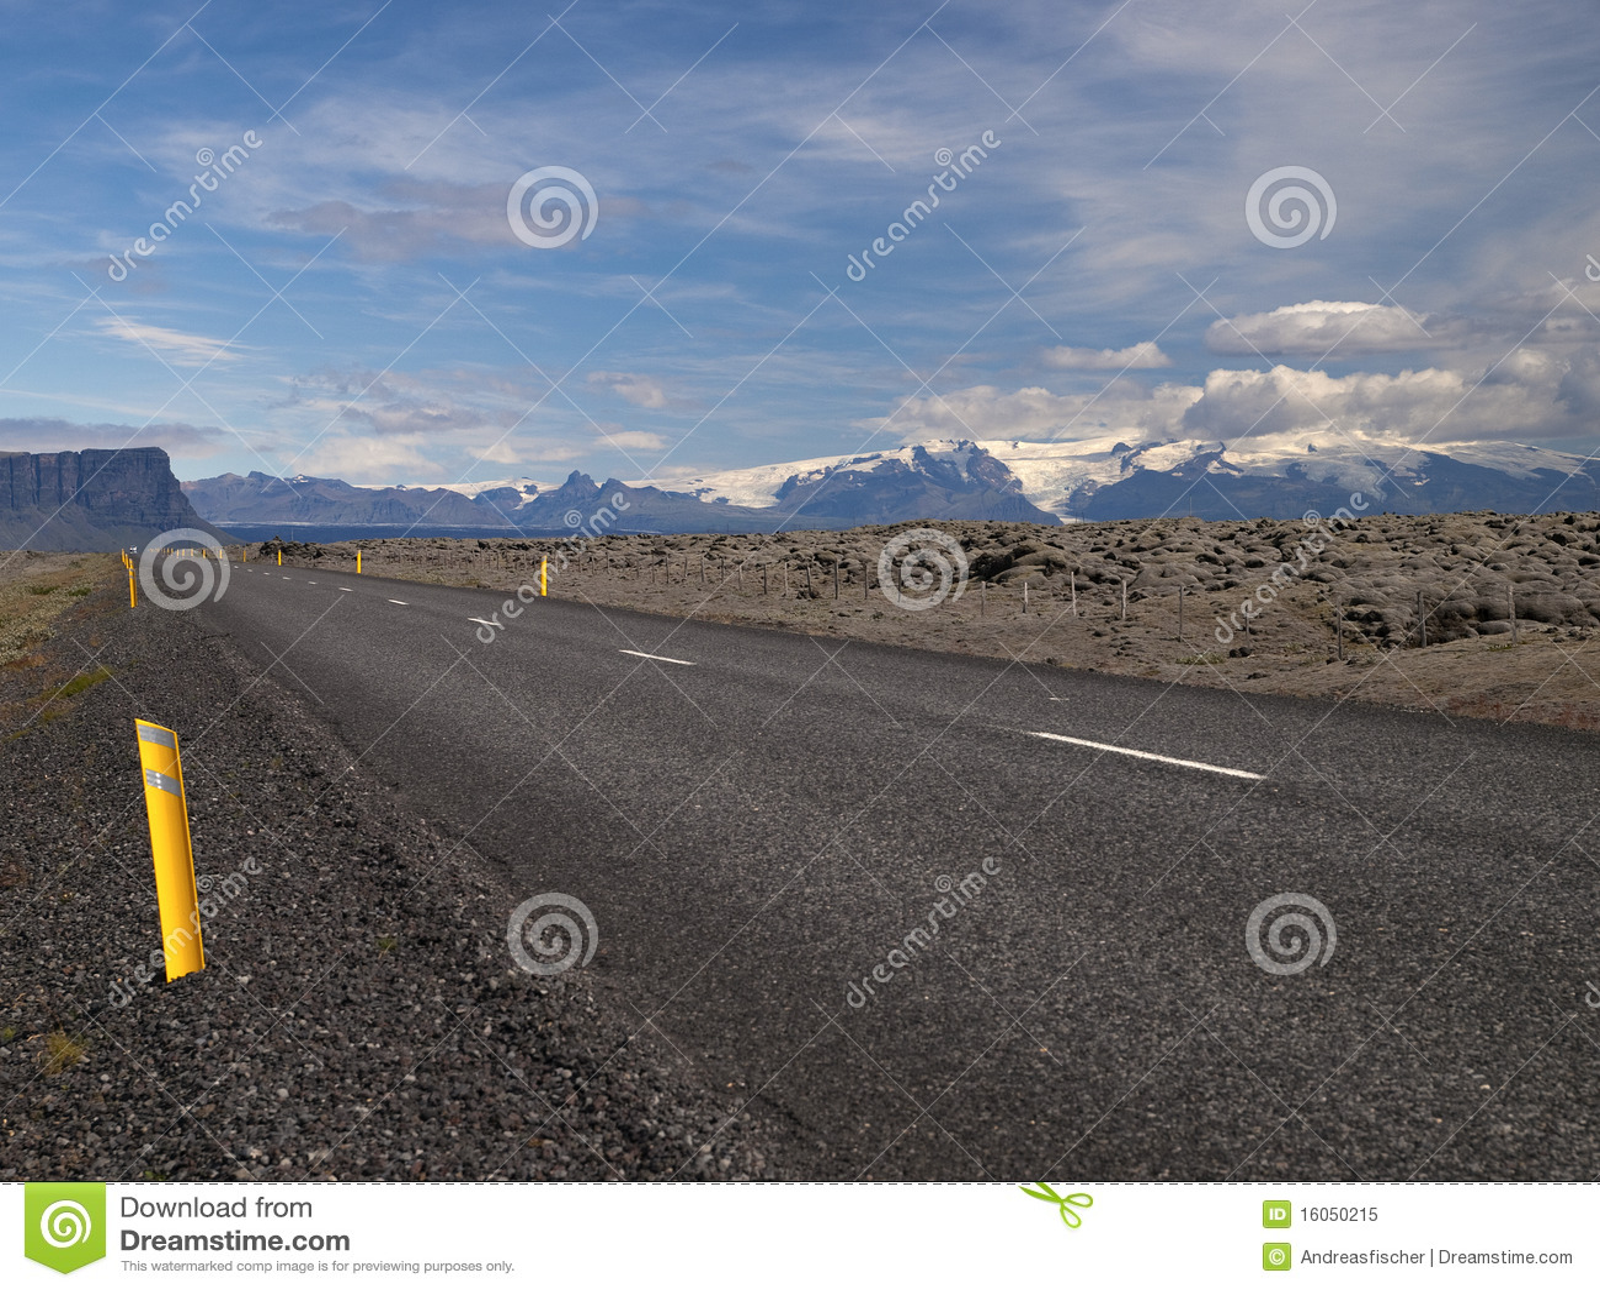 Road no. 1 - Iceland